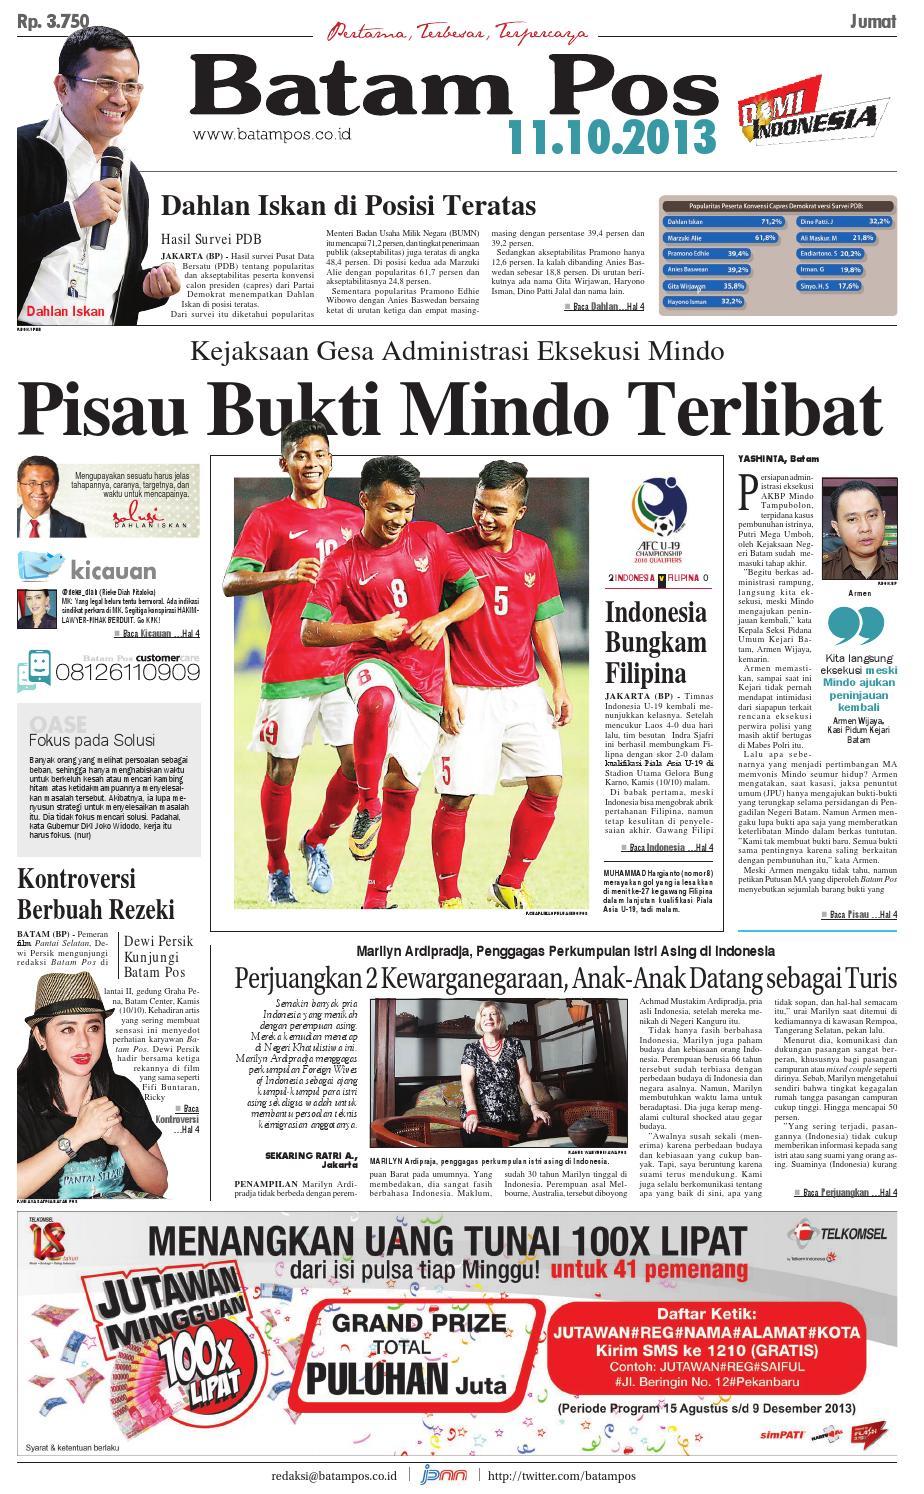 11 Oktober 2013 By Batampos Newspaper Issuu Revo Fit Raving Red Klaten